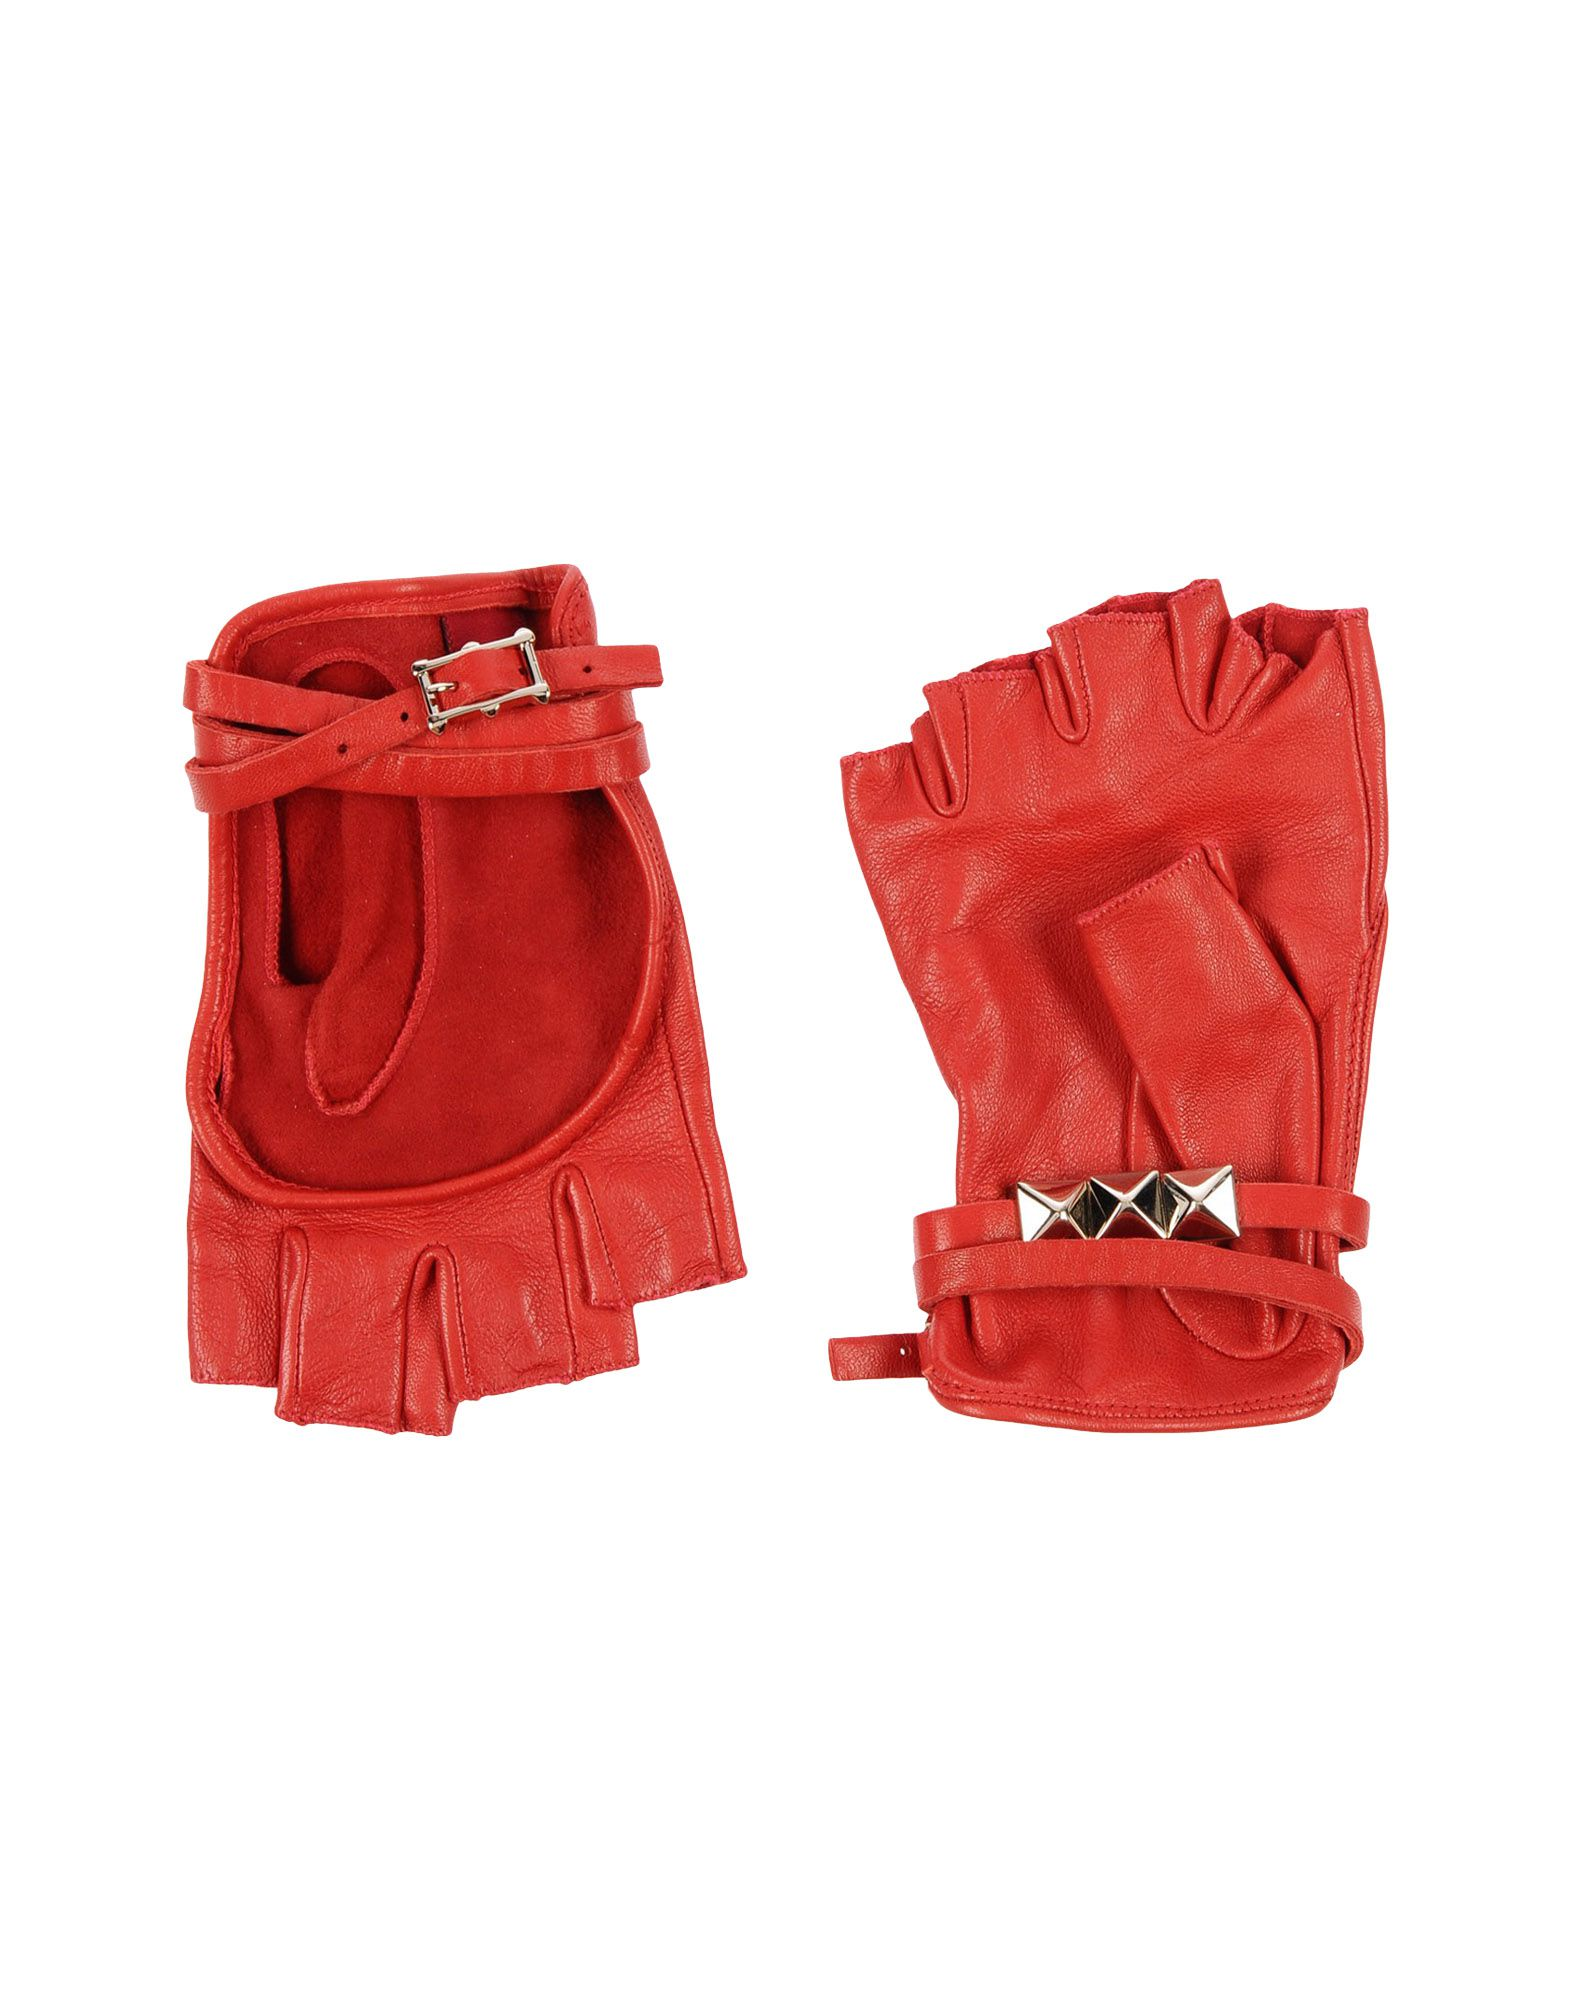 VALENTINO GARAVANI Перчатки стрельба из лука защитите перчатки 3 пальцы тянуть поклон стрелка кожа съемки перчатки